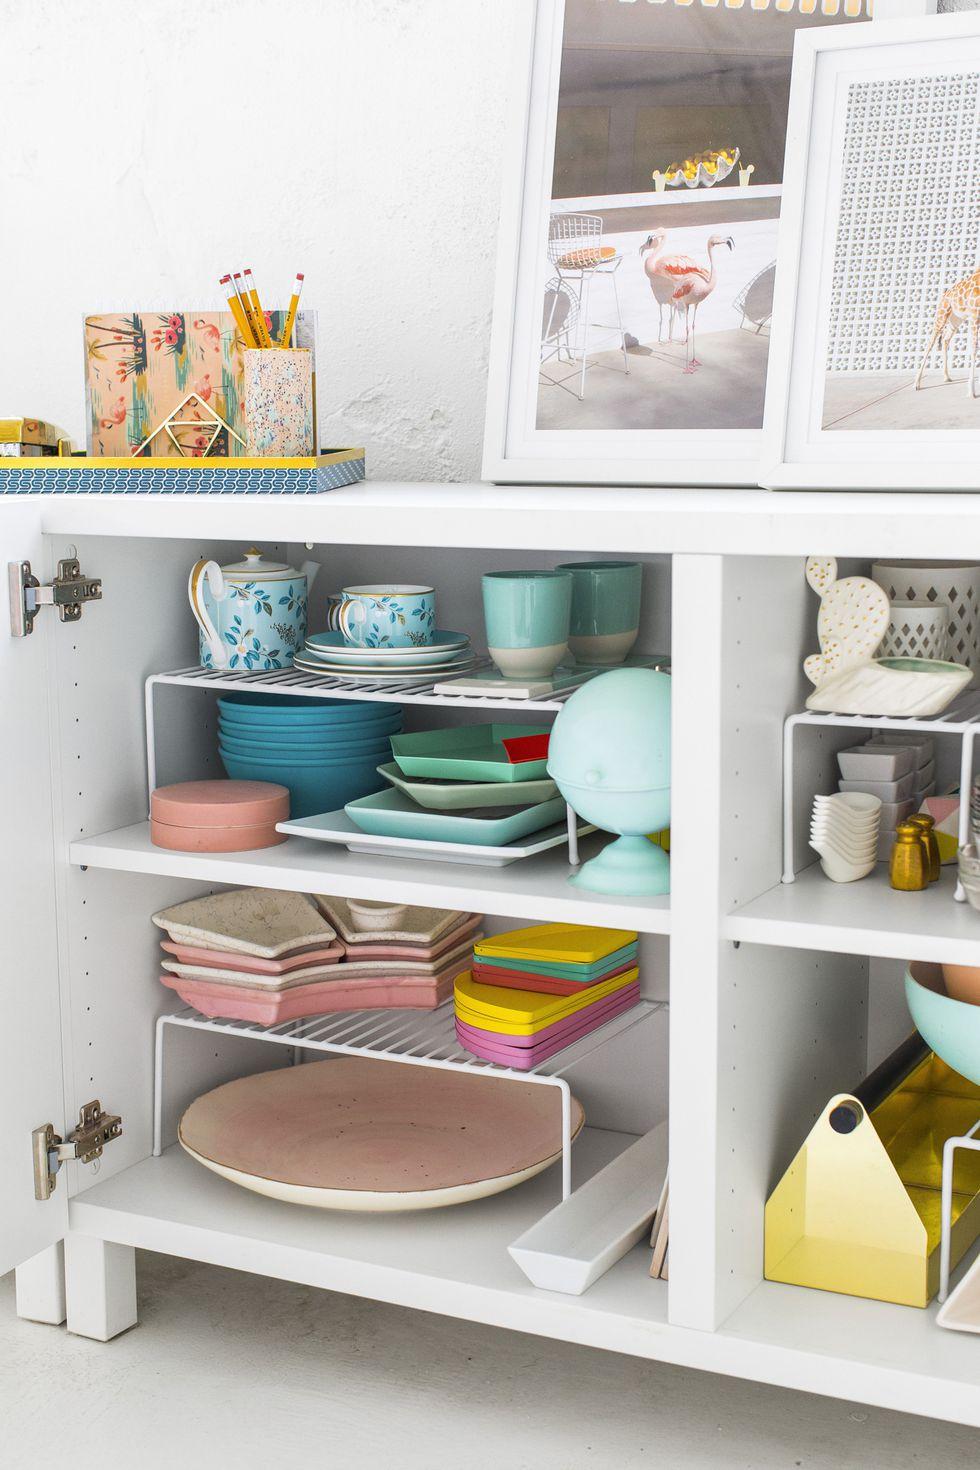 10 Use Wire Shelf Risers to Expand the Storage Space via Simphome